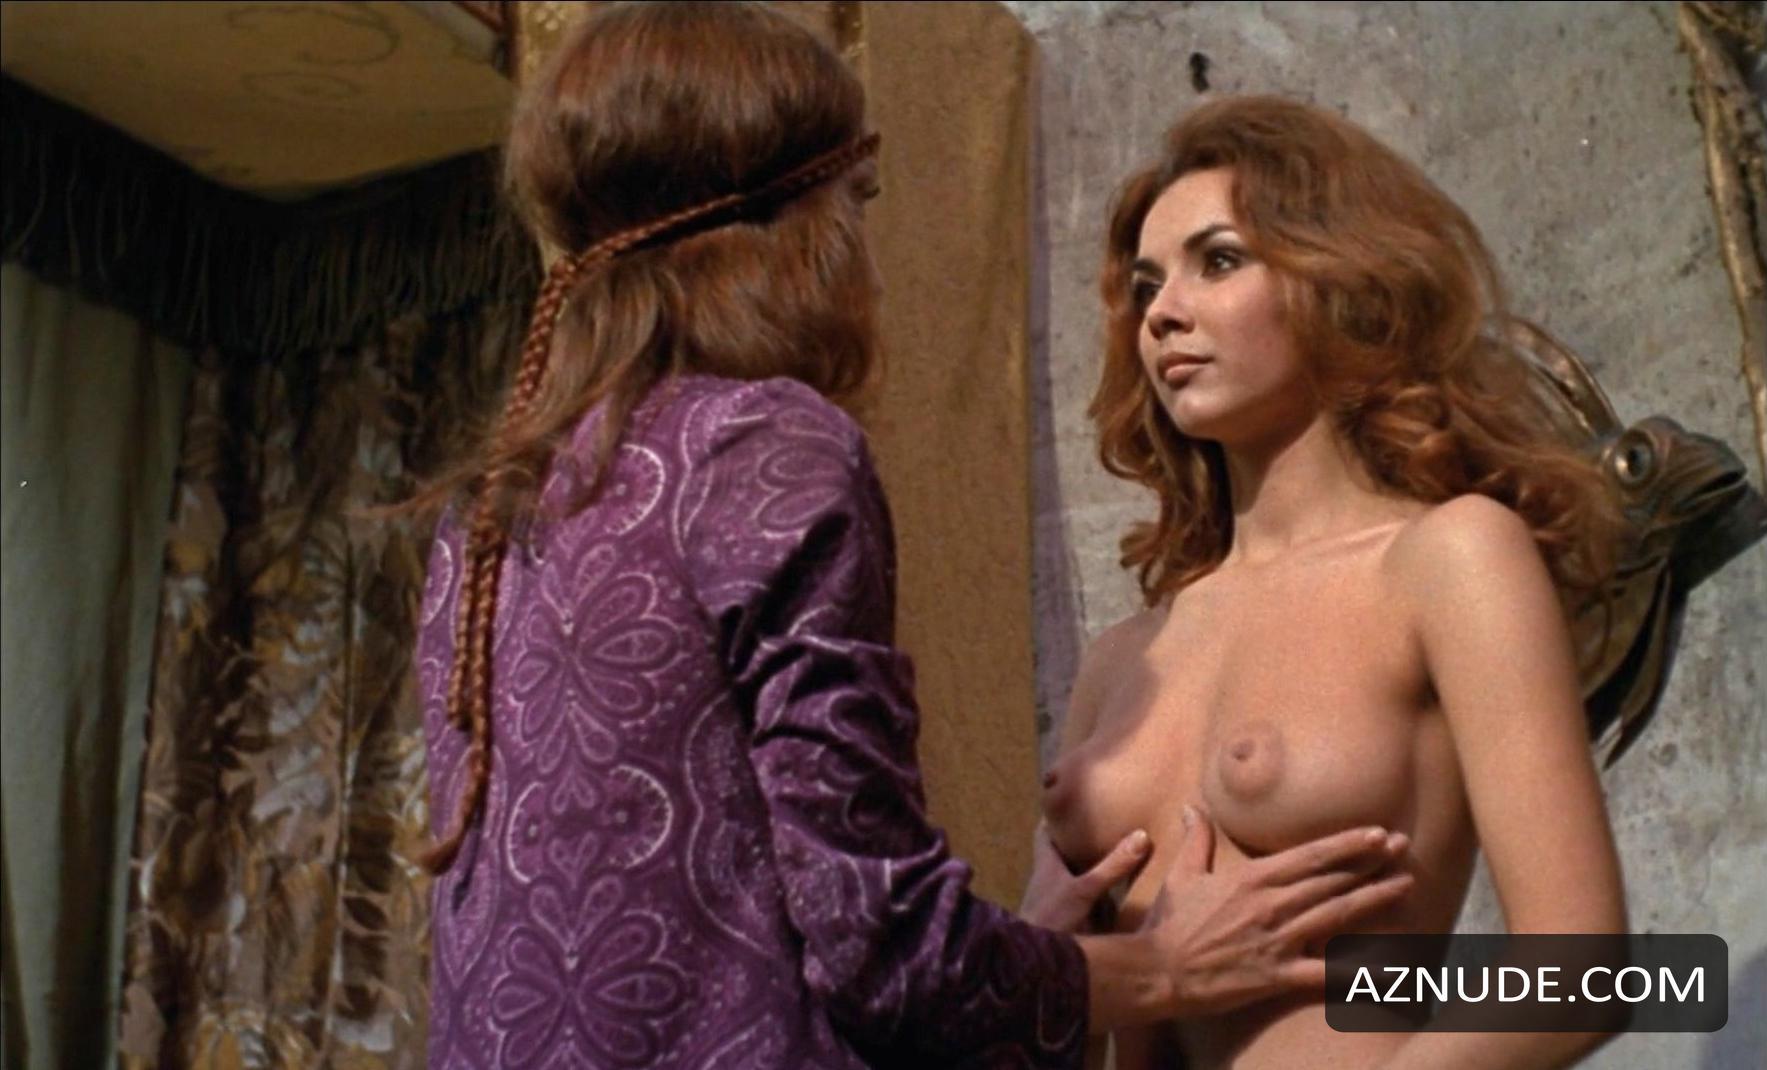 real vampires girls nude